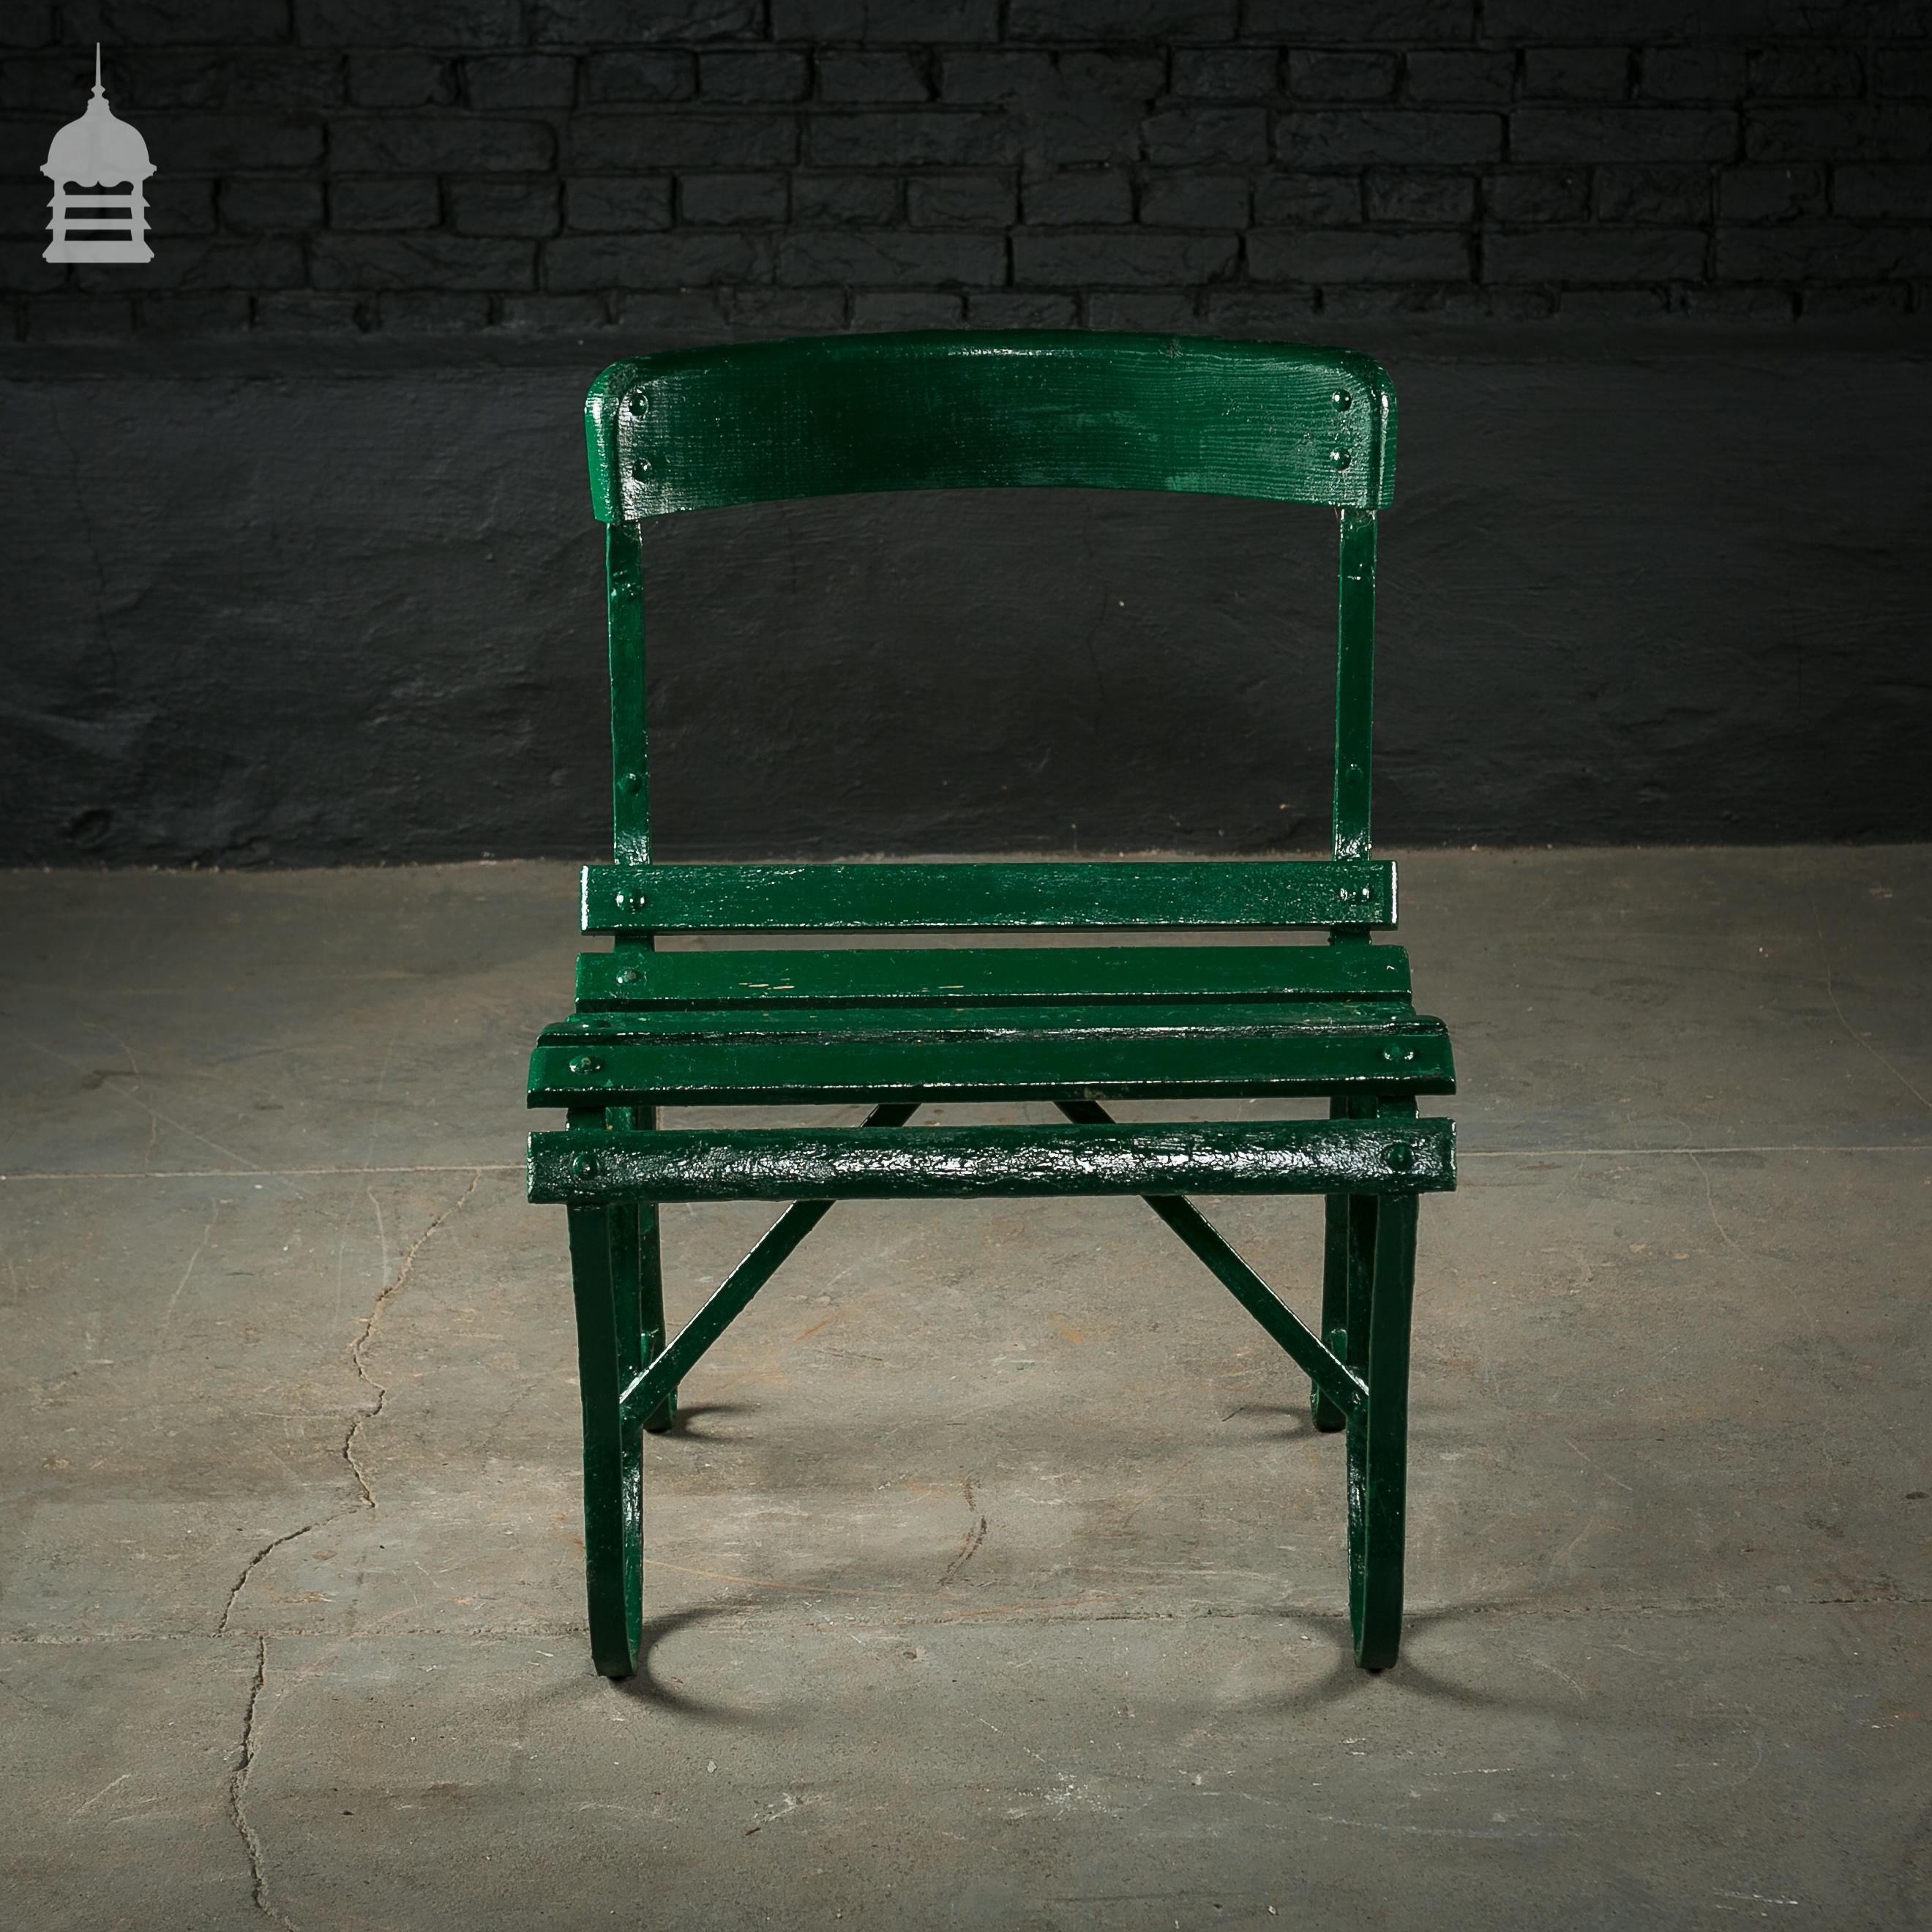 4 Wrought Iron Garden Chairs with Hardwood Slats 4